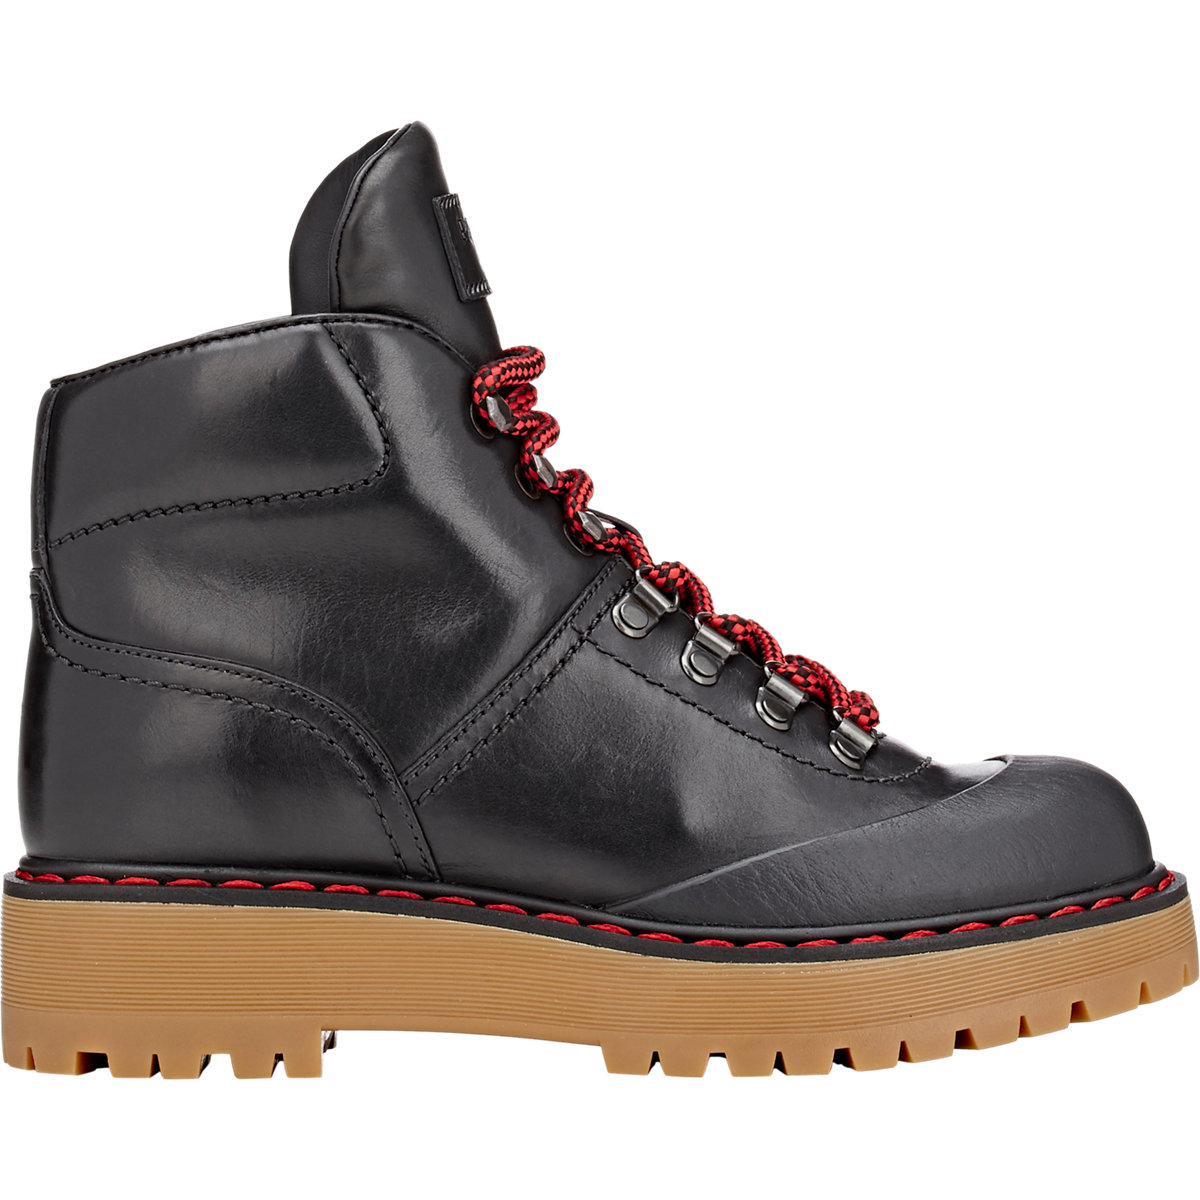 Excellent Boots Prada Women Leather Black 1W087GNERO  EBay